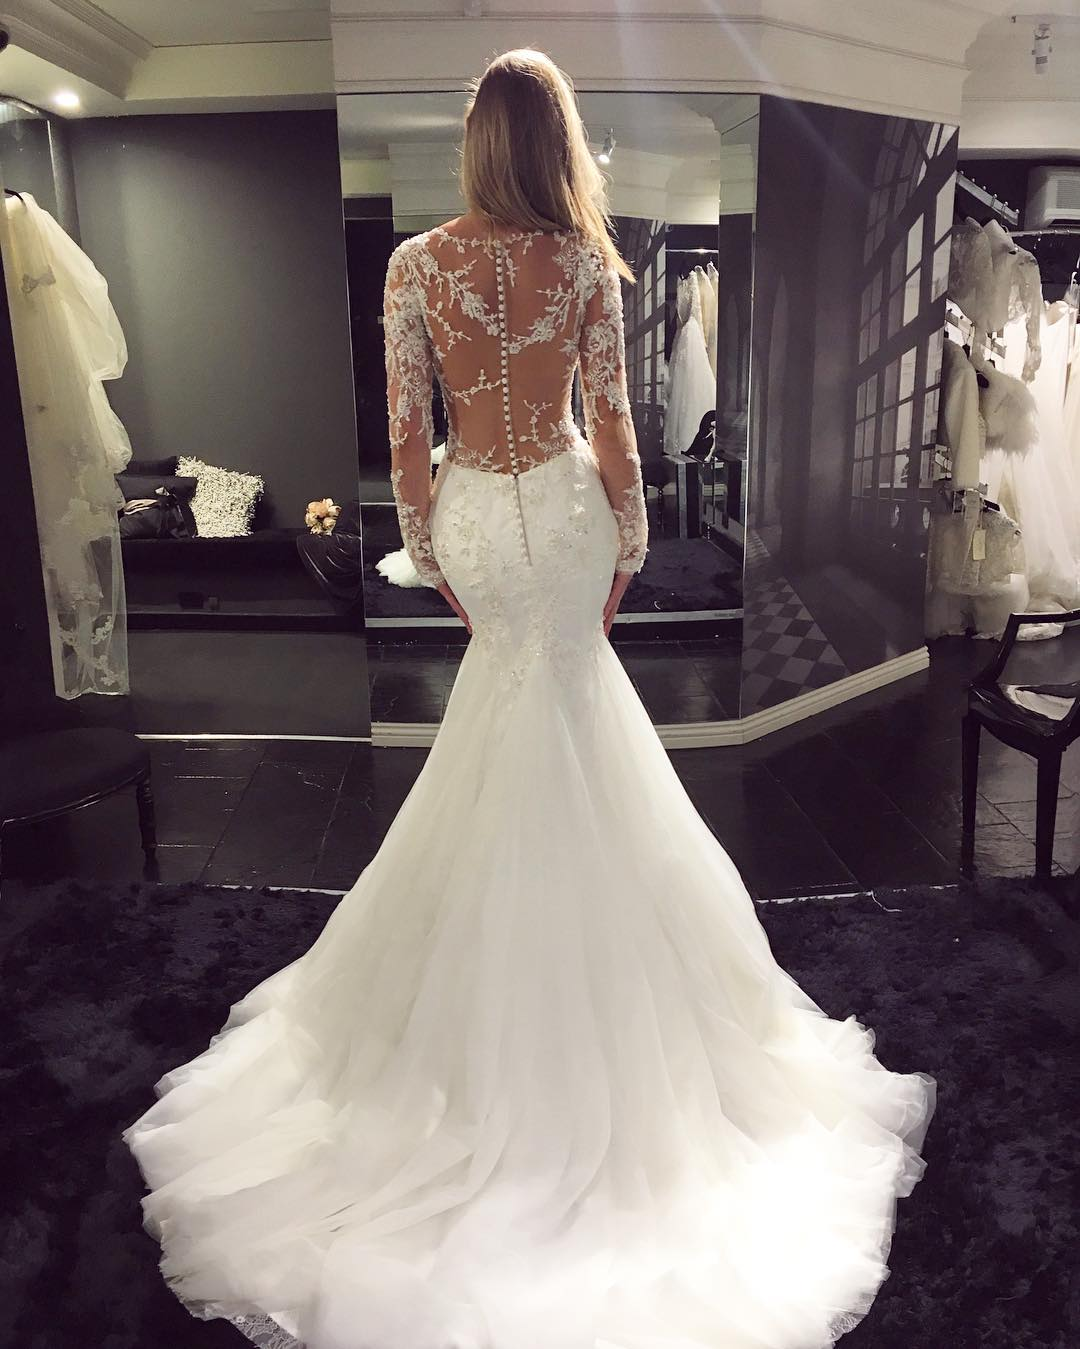 Elegant mermaid wedding dresses long sleeves lace beading sheer elegant mermaid wedding dresses long sleeves lace beading sheer amazing bridal gowns thumbnail 1 junglespirit Images